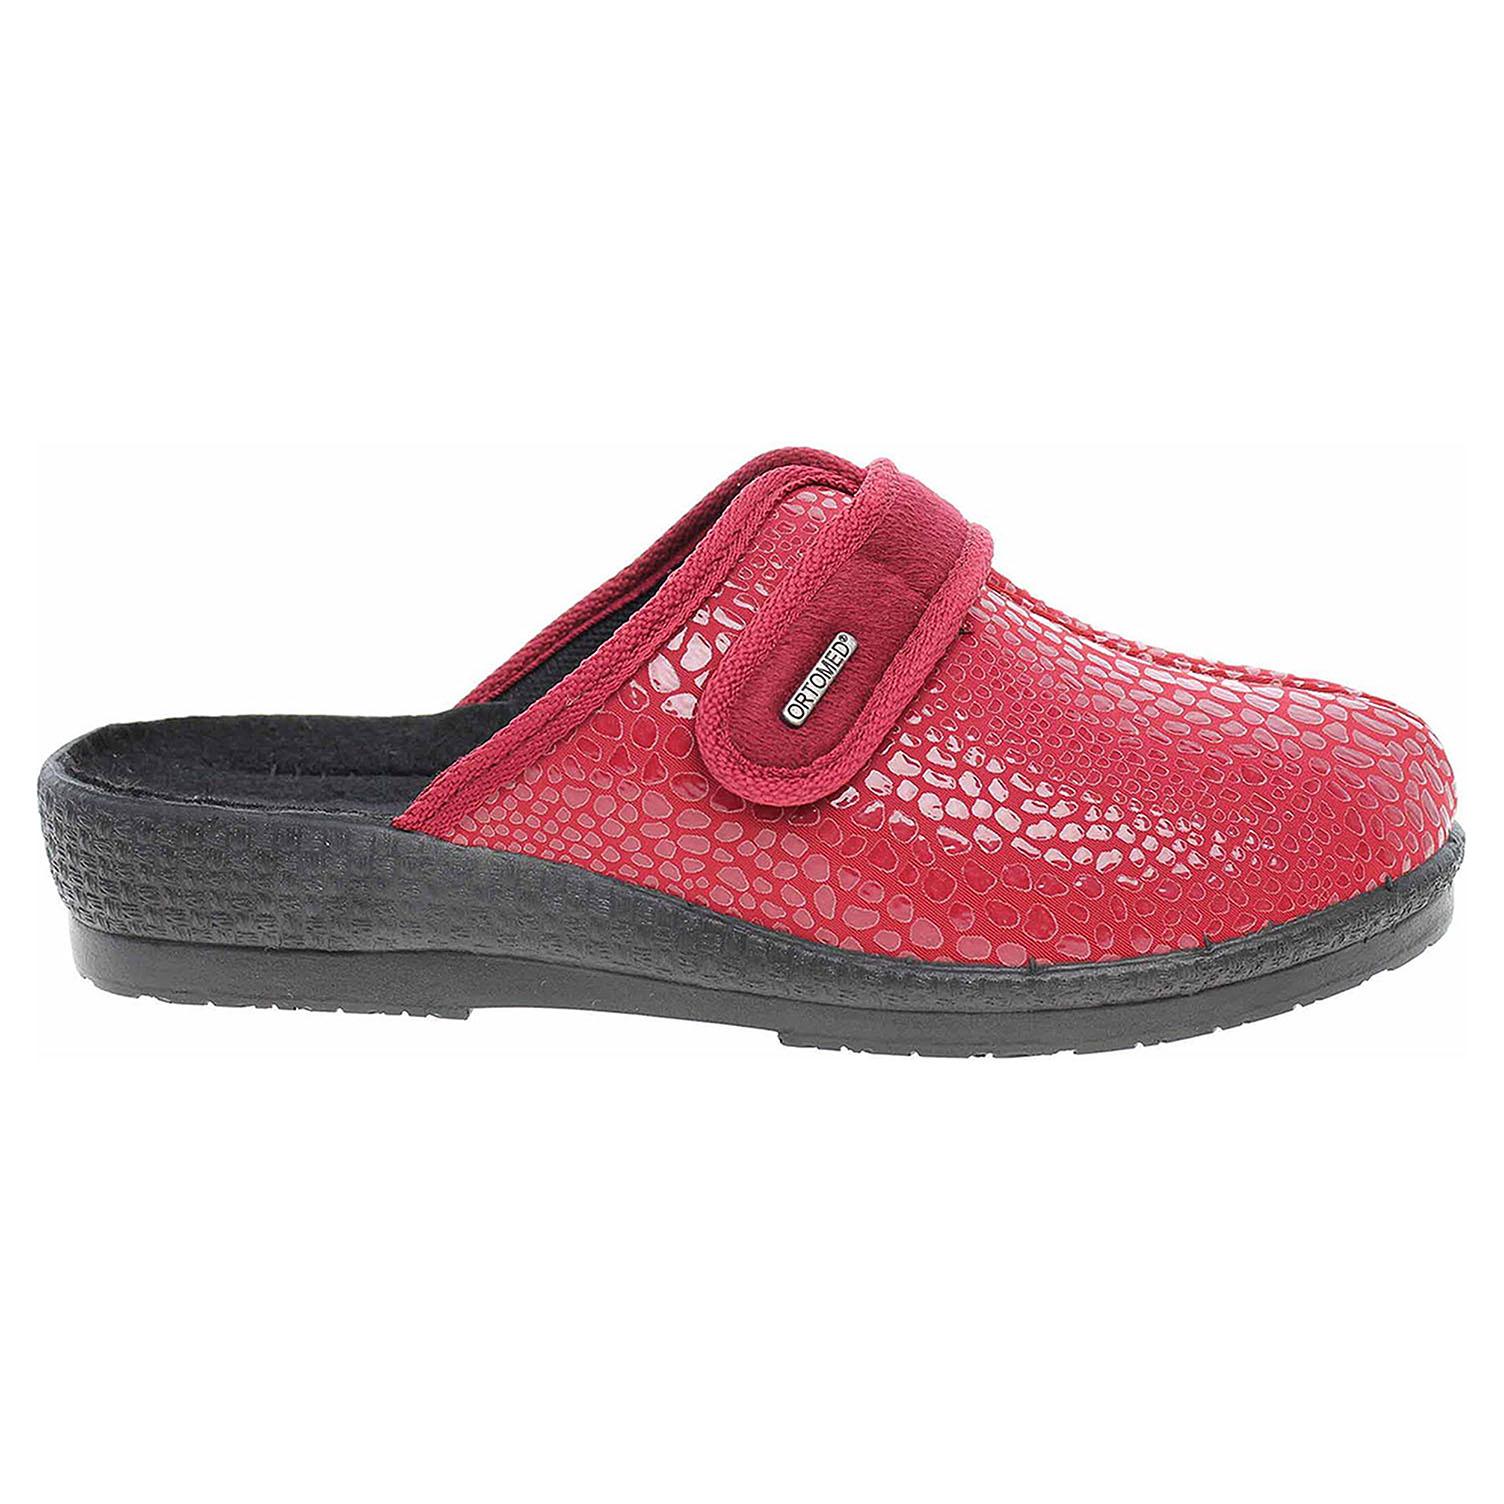 Ecco Rogallo dámské domácí pantofle 3370-011 bordo 23500548